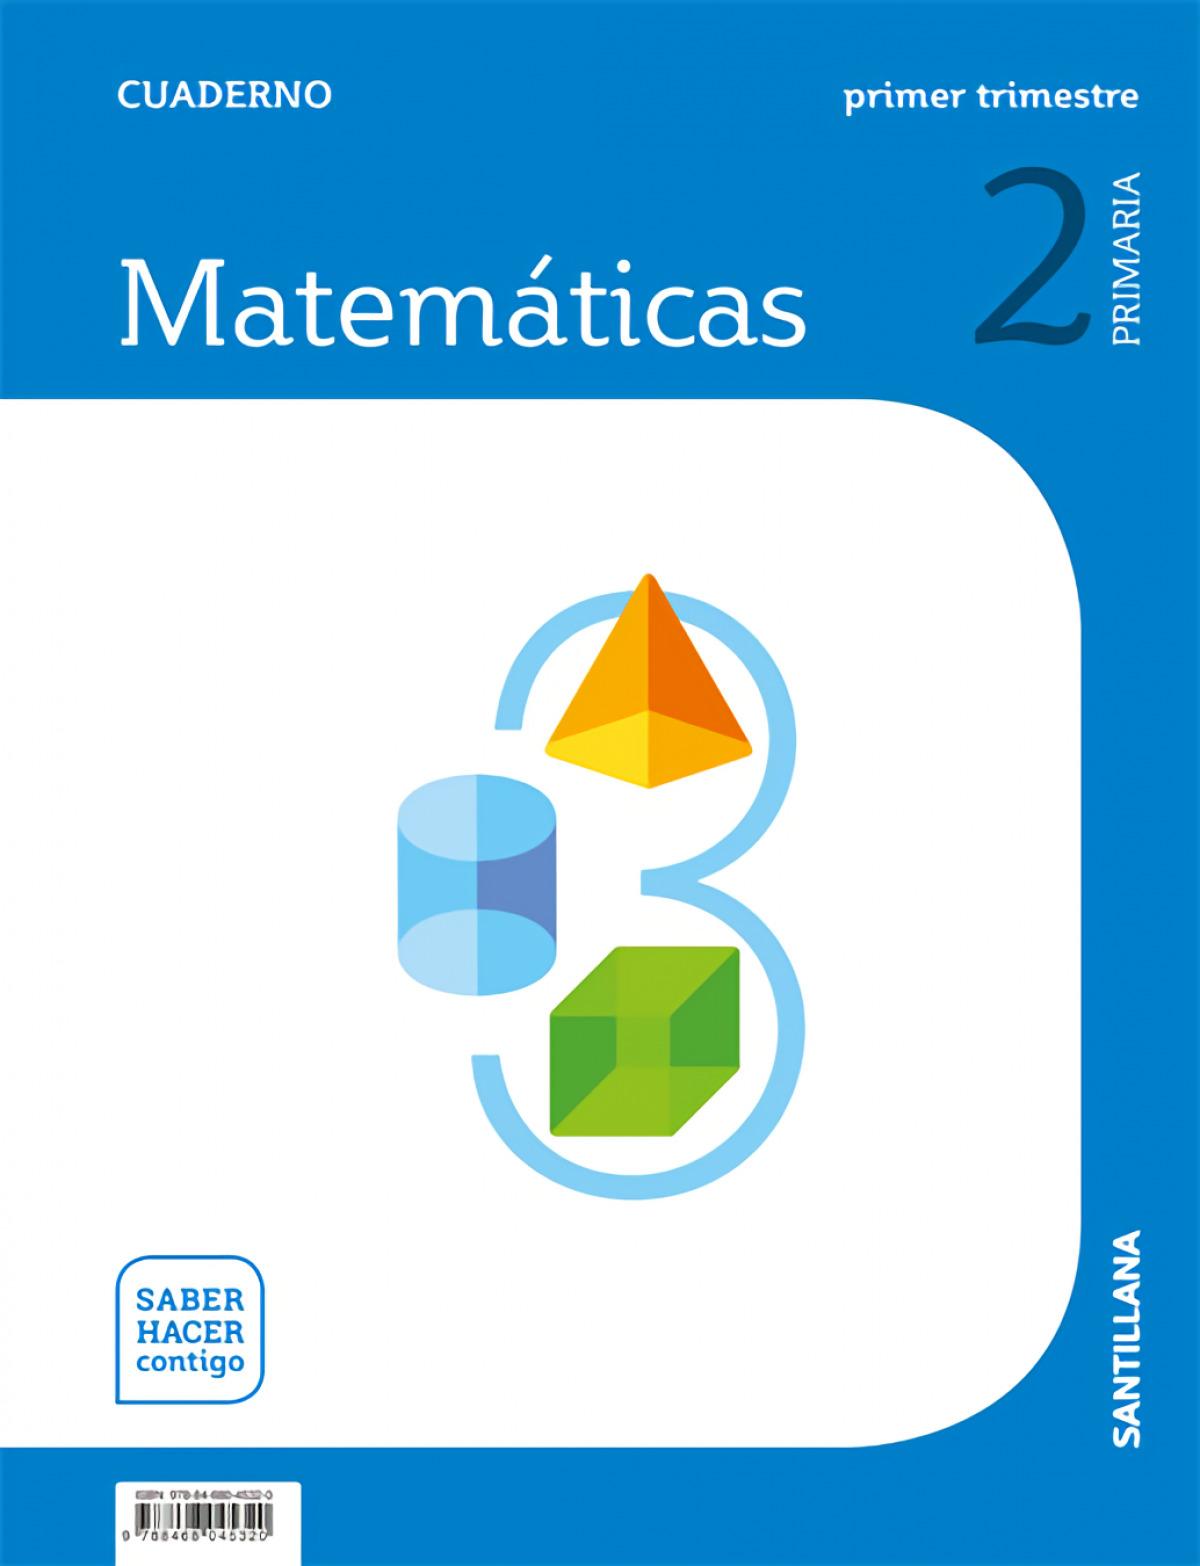 CUADERNO MATEMÁTICAS 1-2o.PRIMARIA. SABER HACER CONTIGO 9788468045320